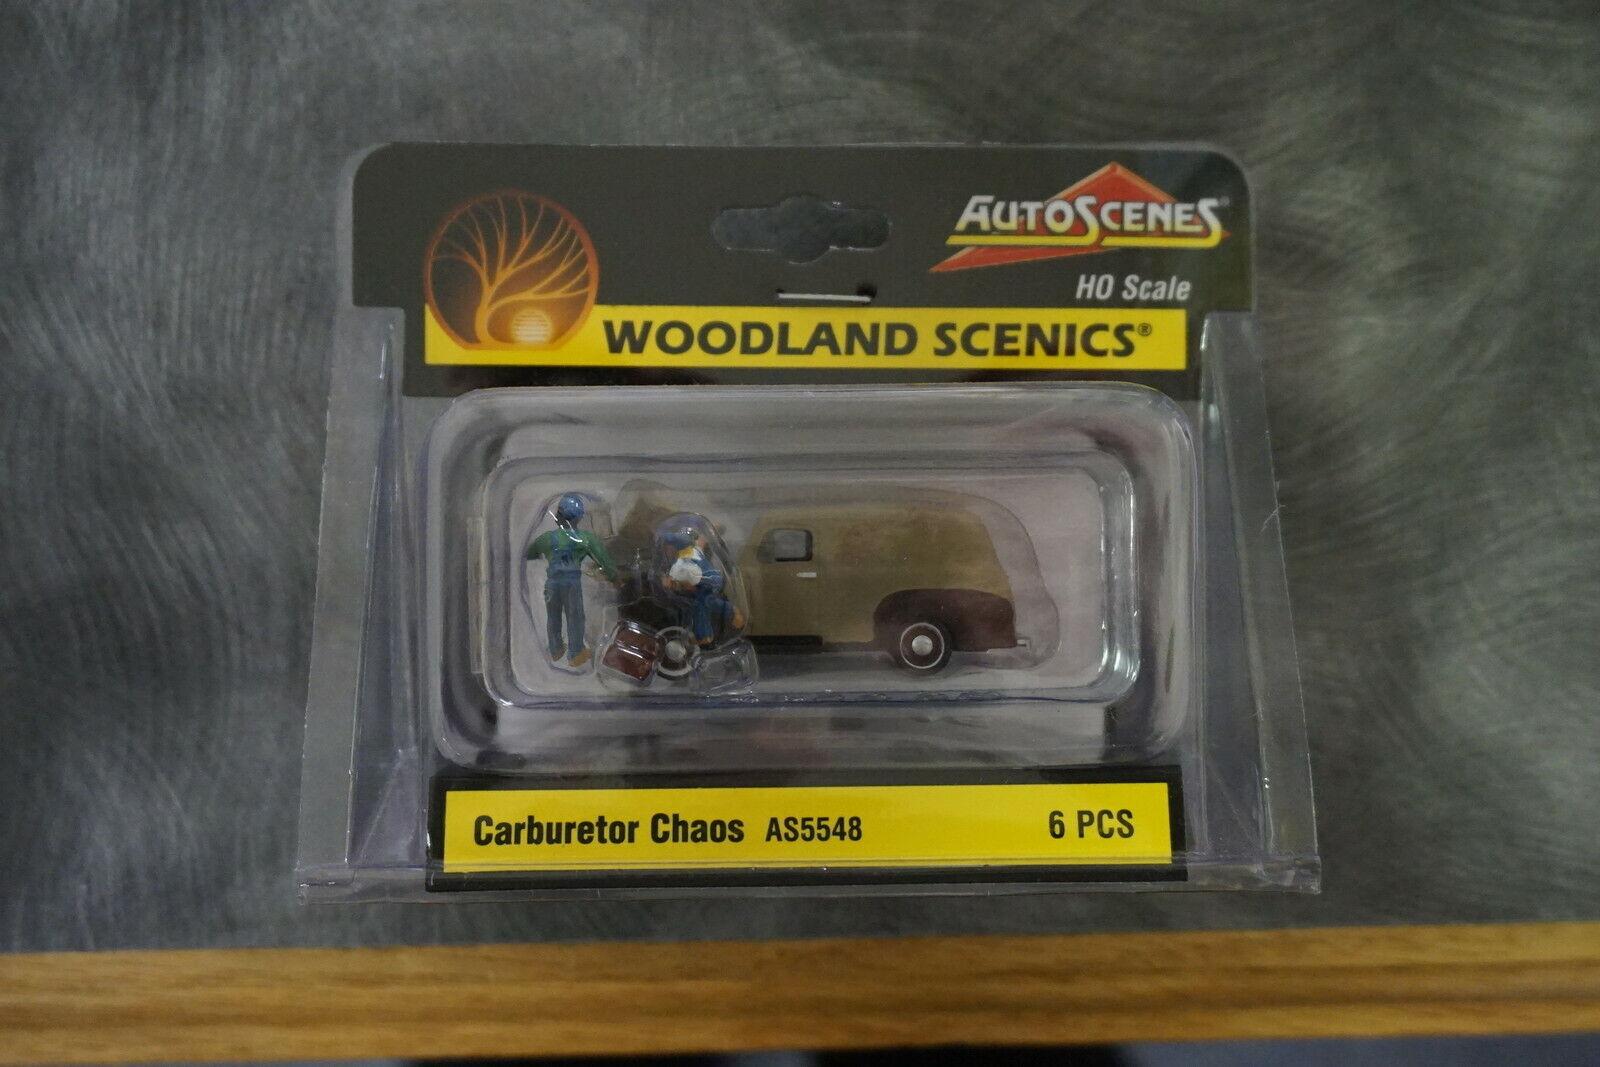 Carburetor Chaos HO Scale Woodland Scenics